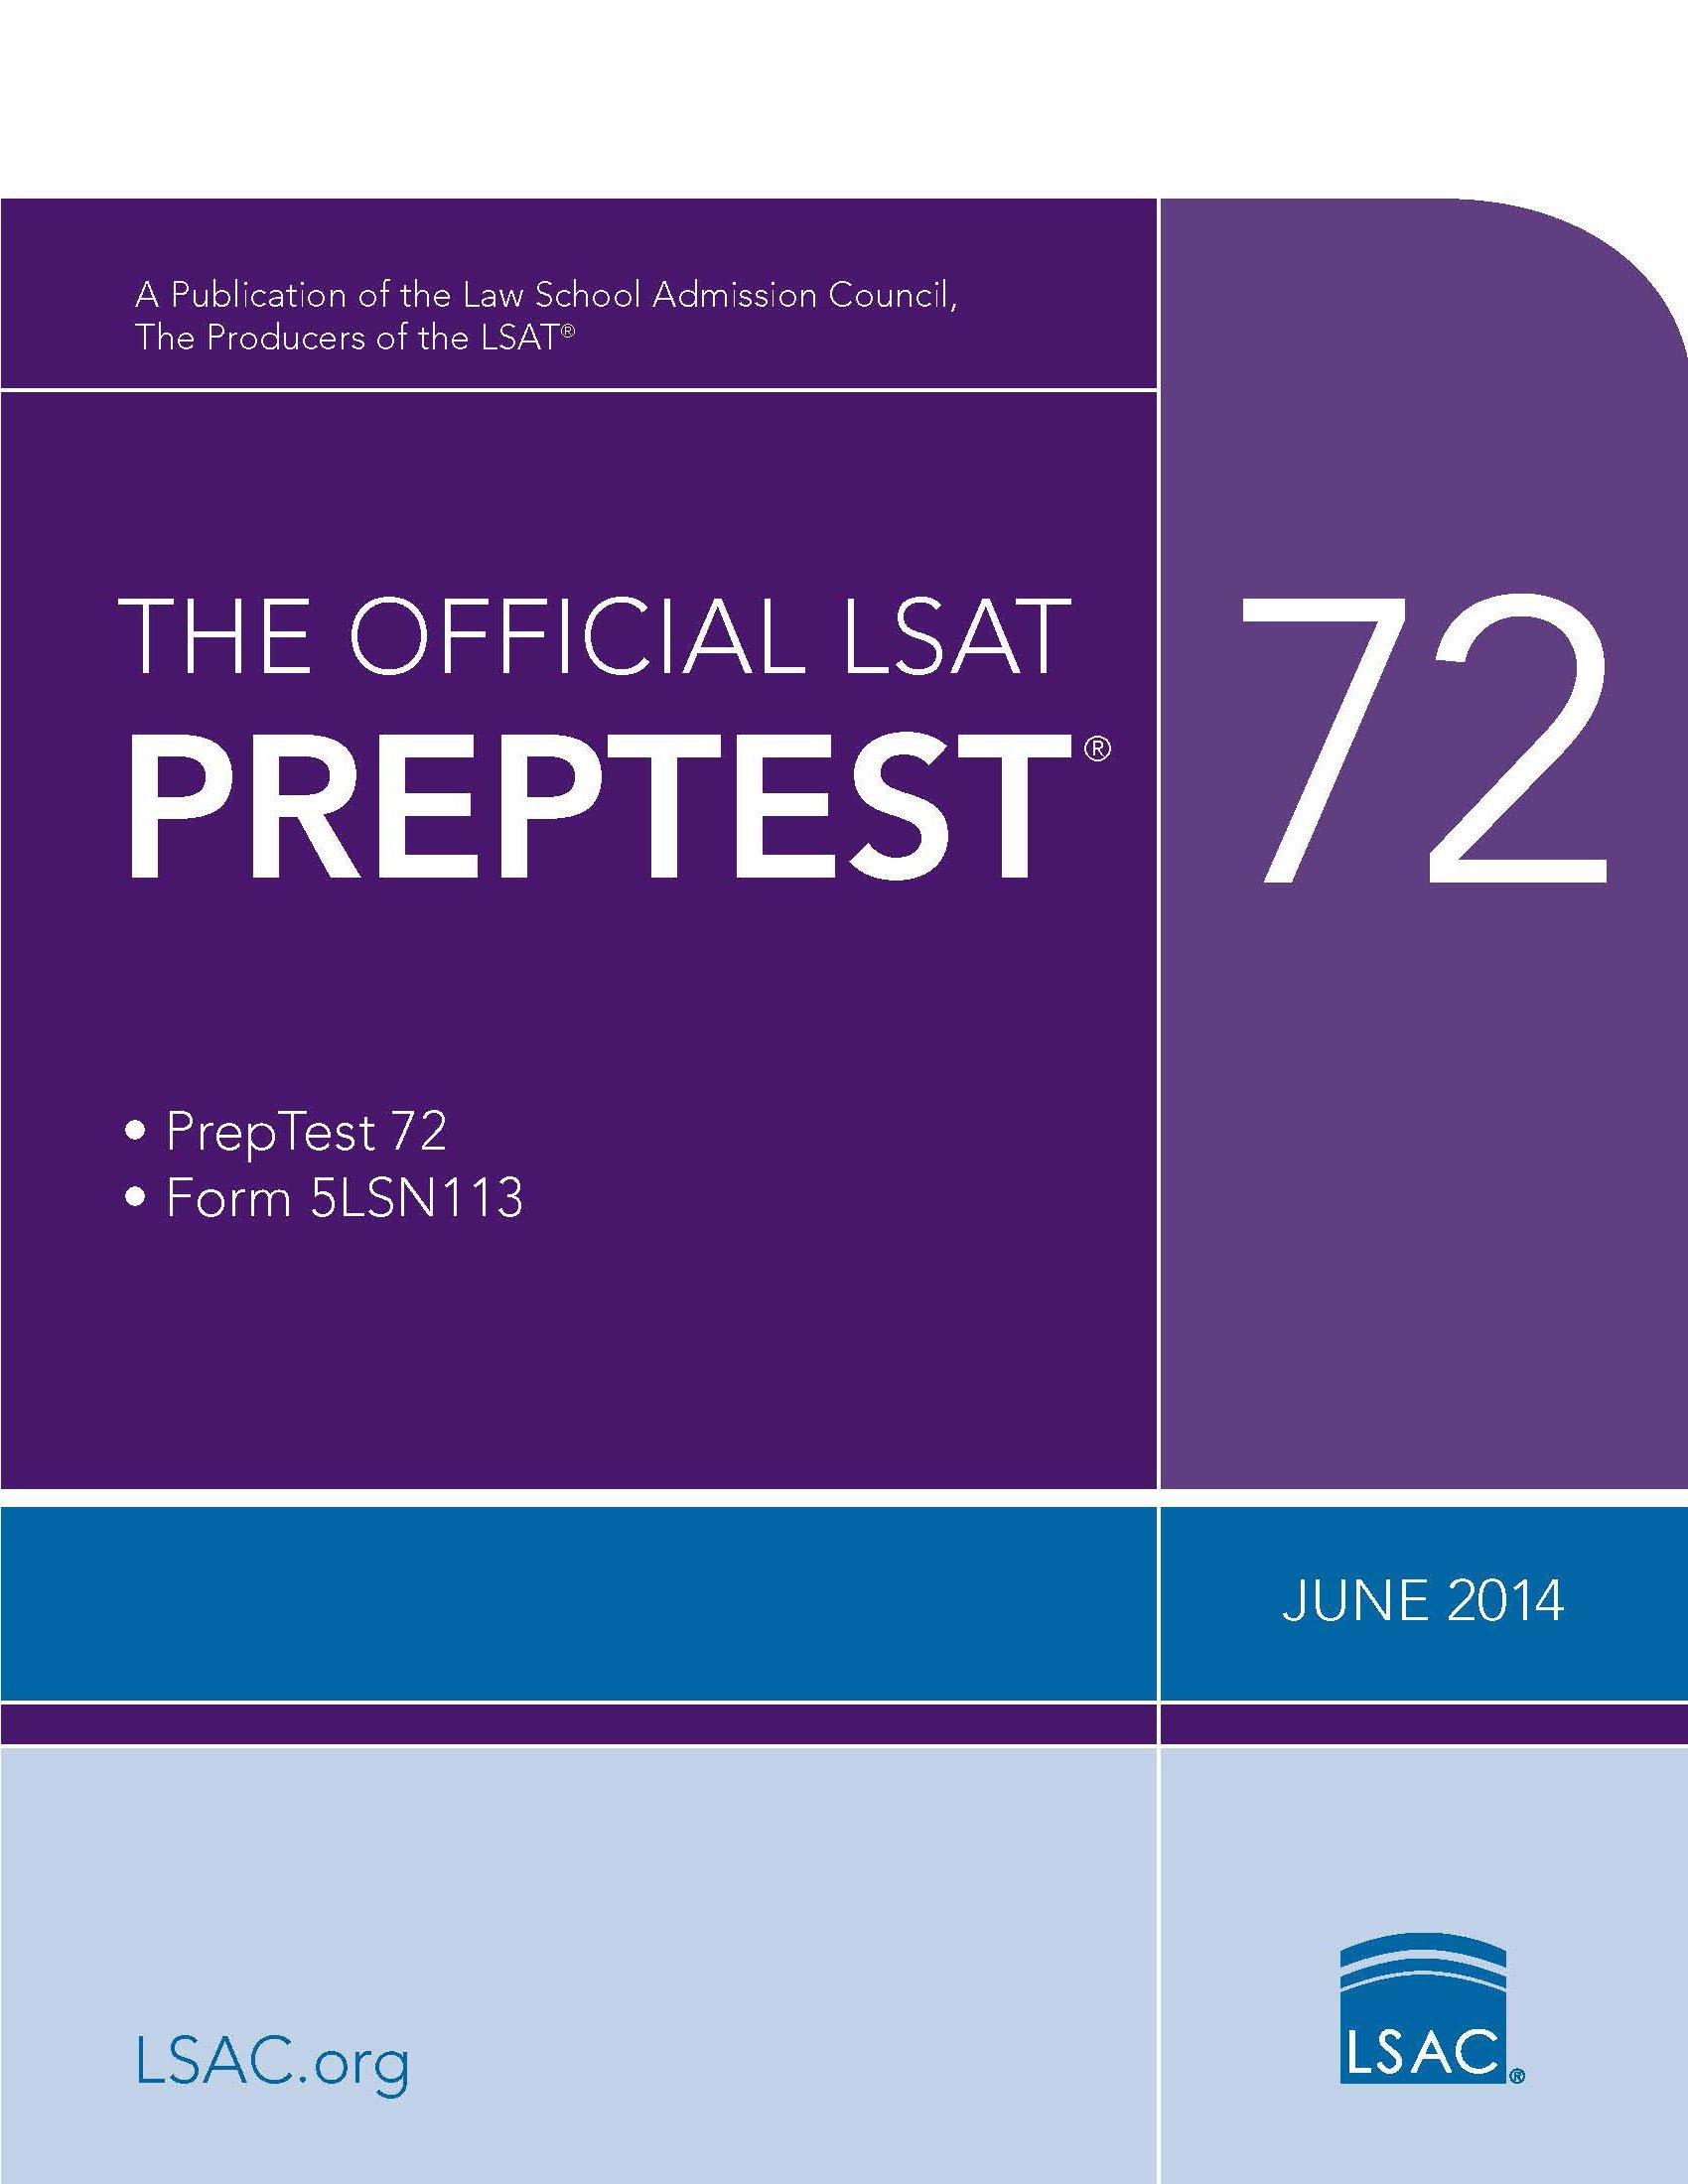 The official lsat preptest 72 june 2014 lsat law school the official lsat preptest 72 june 2014 lsat law school admission council 9780986045523 amazon books geenschuldenfo Choice Image